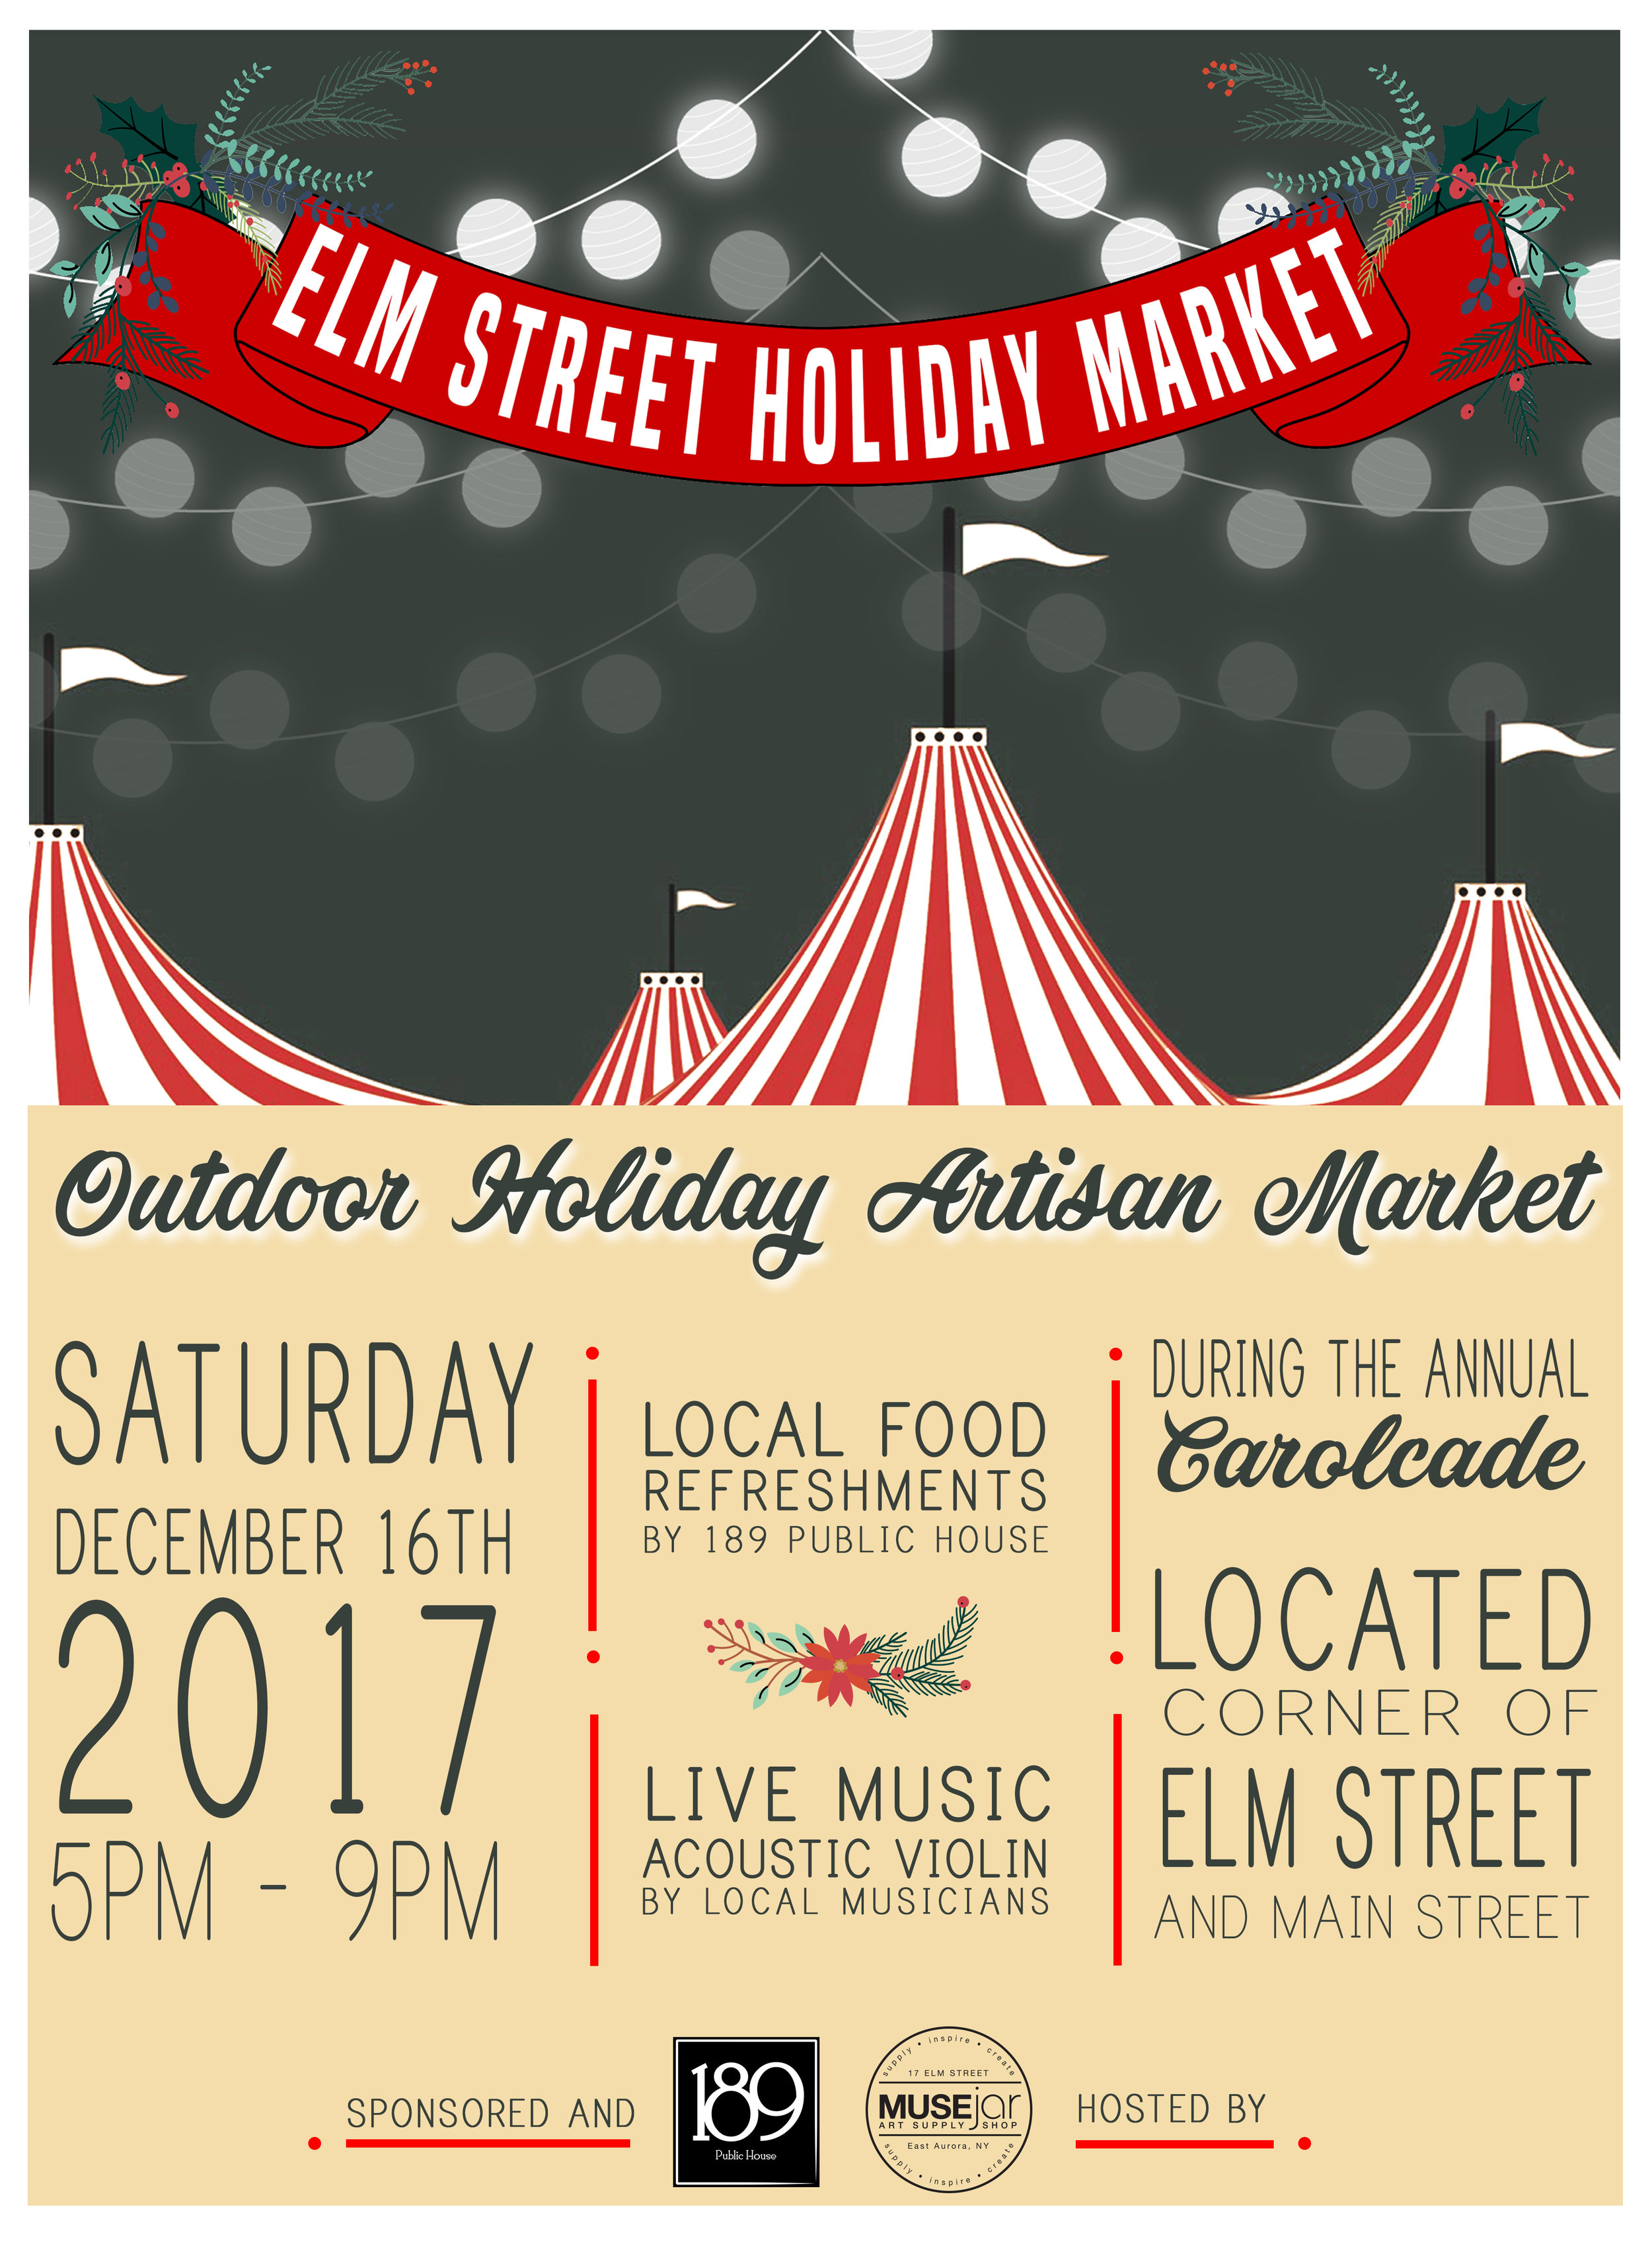 Elm Street Holiday Market 2017 Promo final.jpg